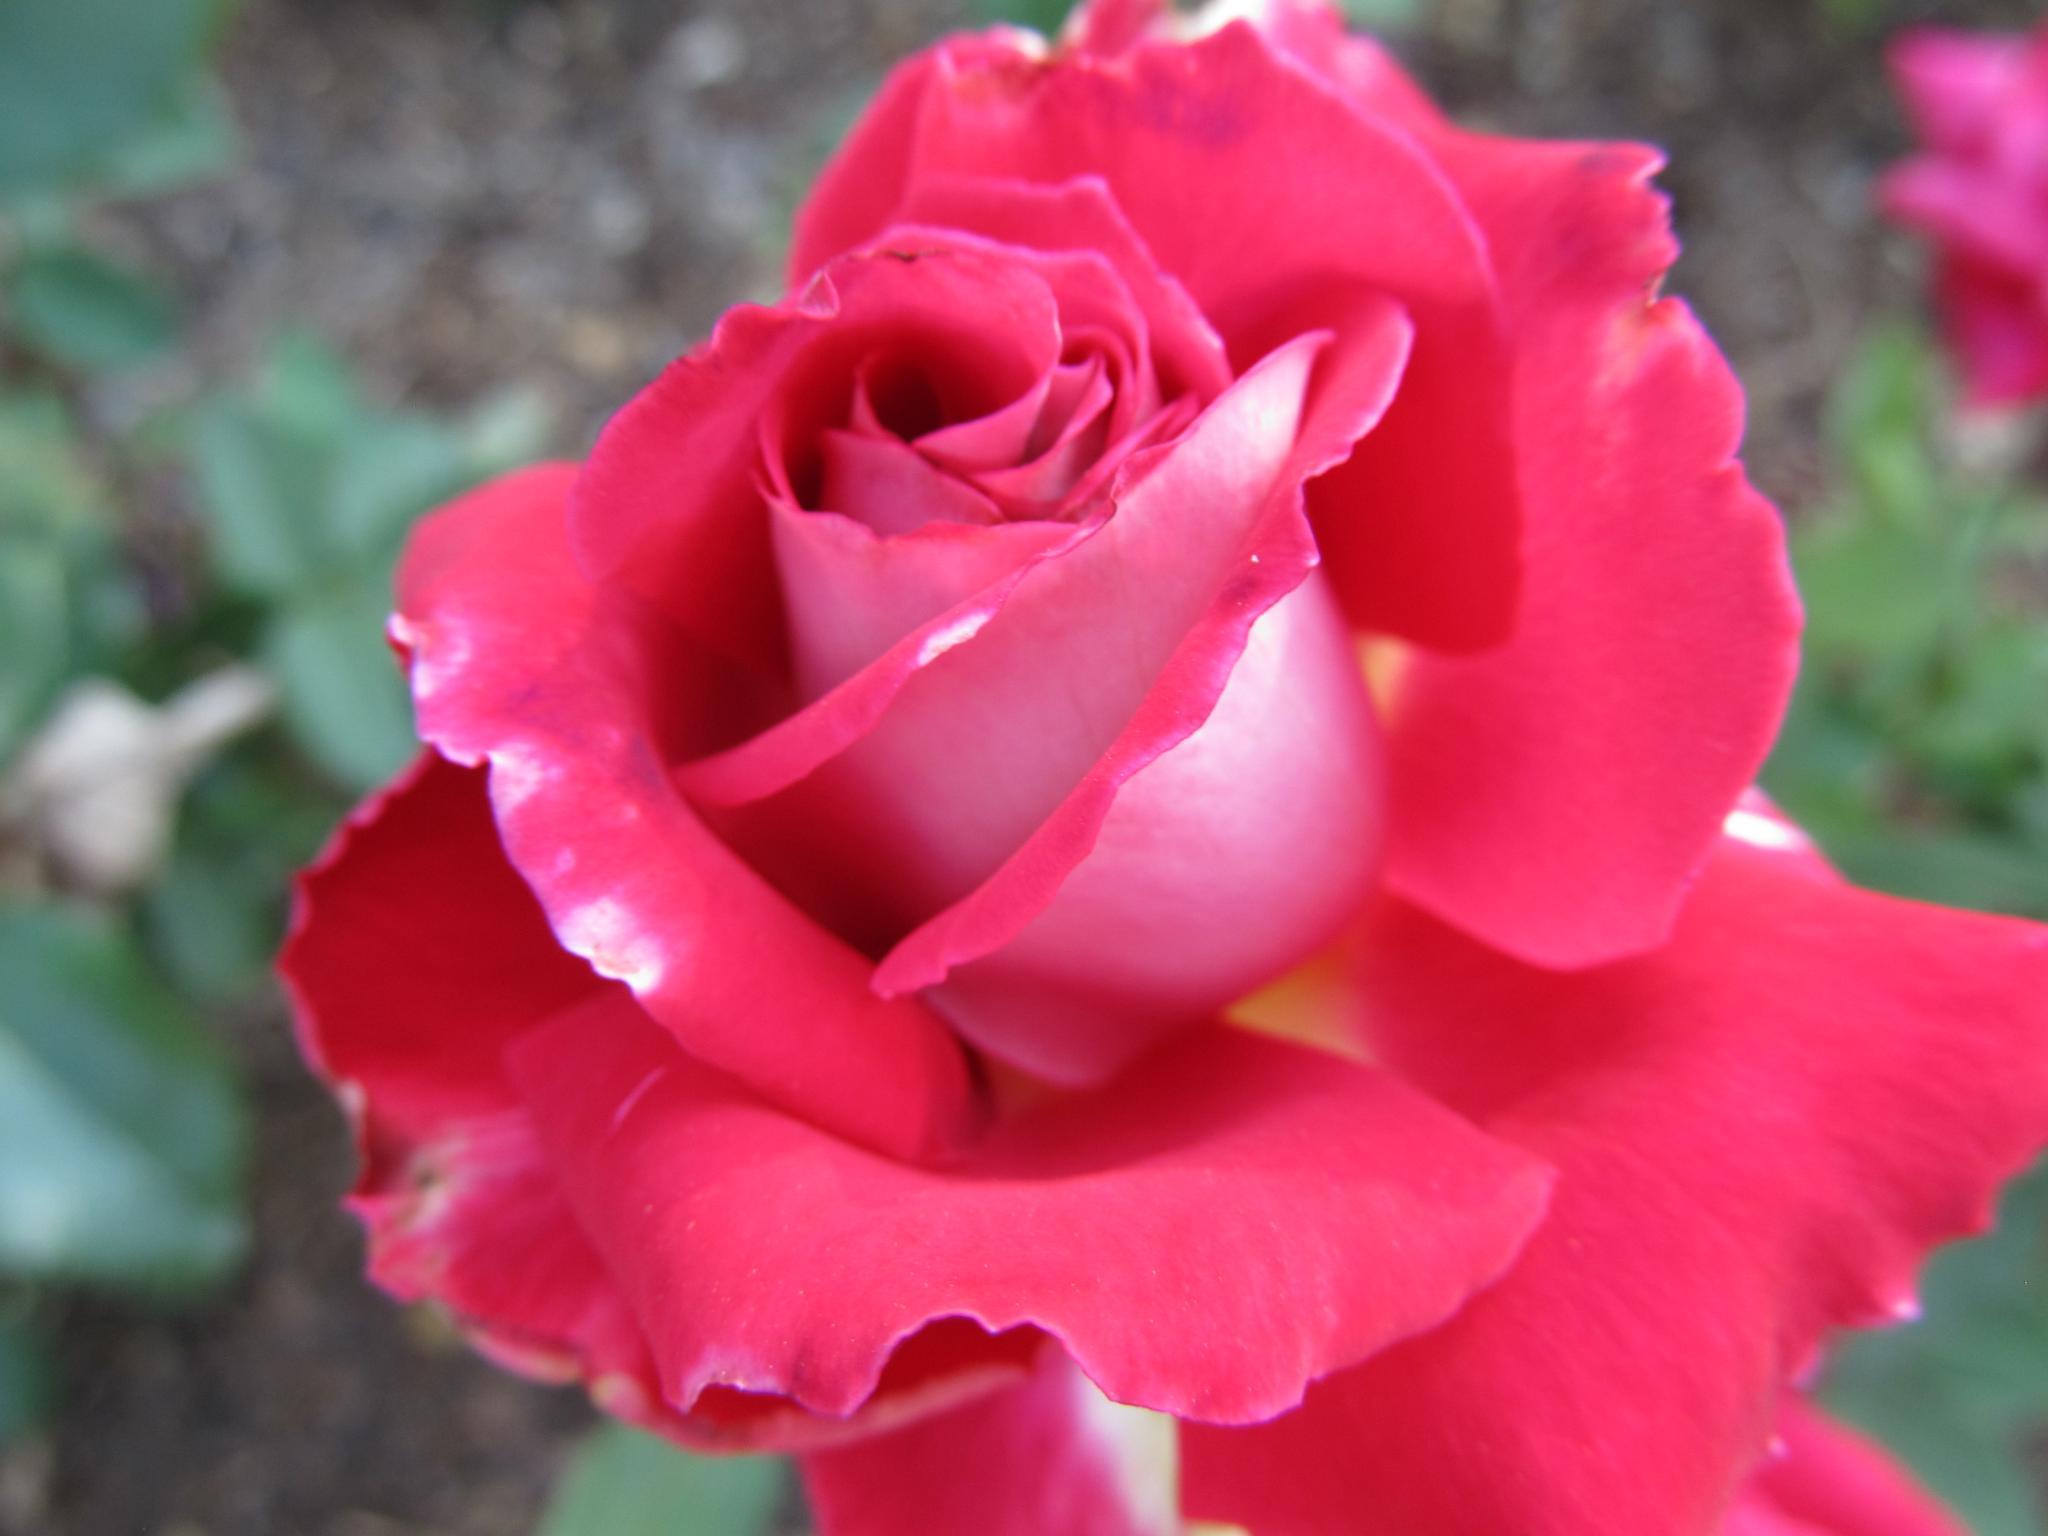 Pink Rose by simonp